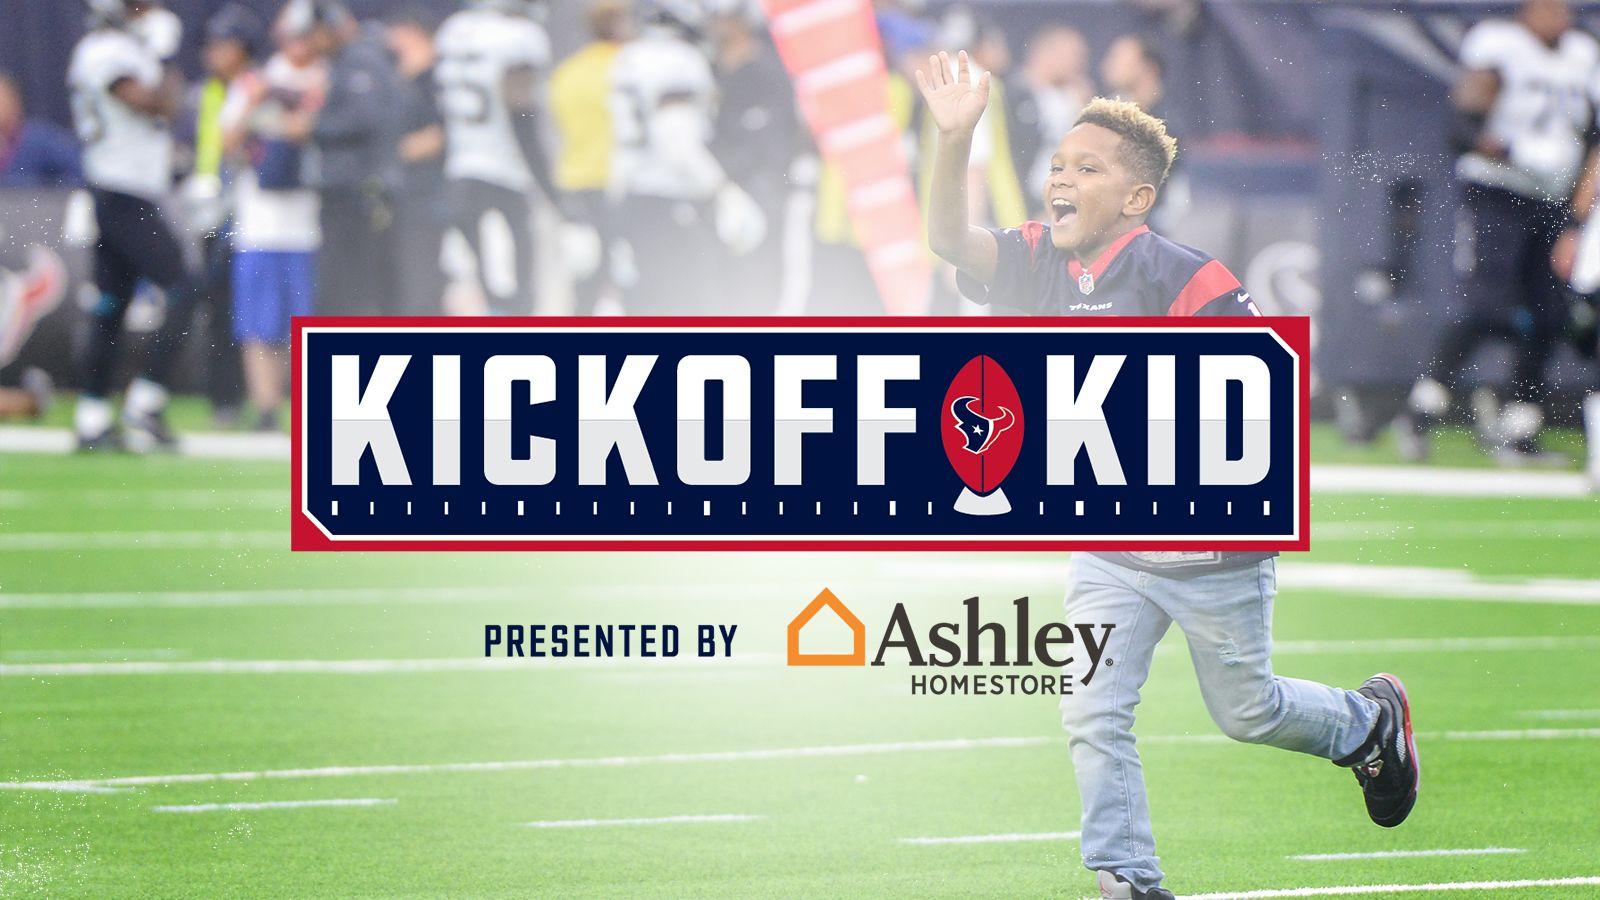 Kickoff Kid Contest